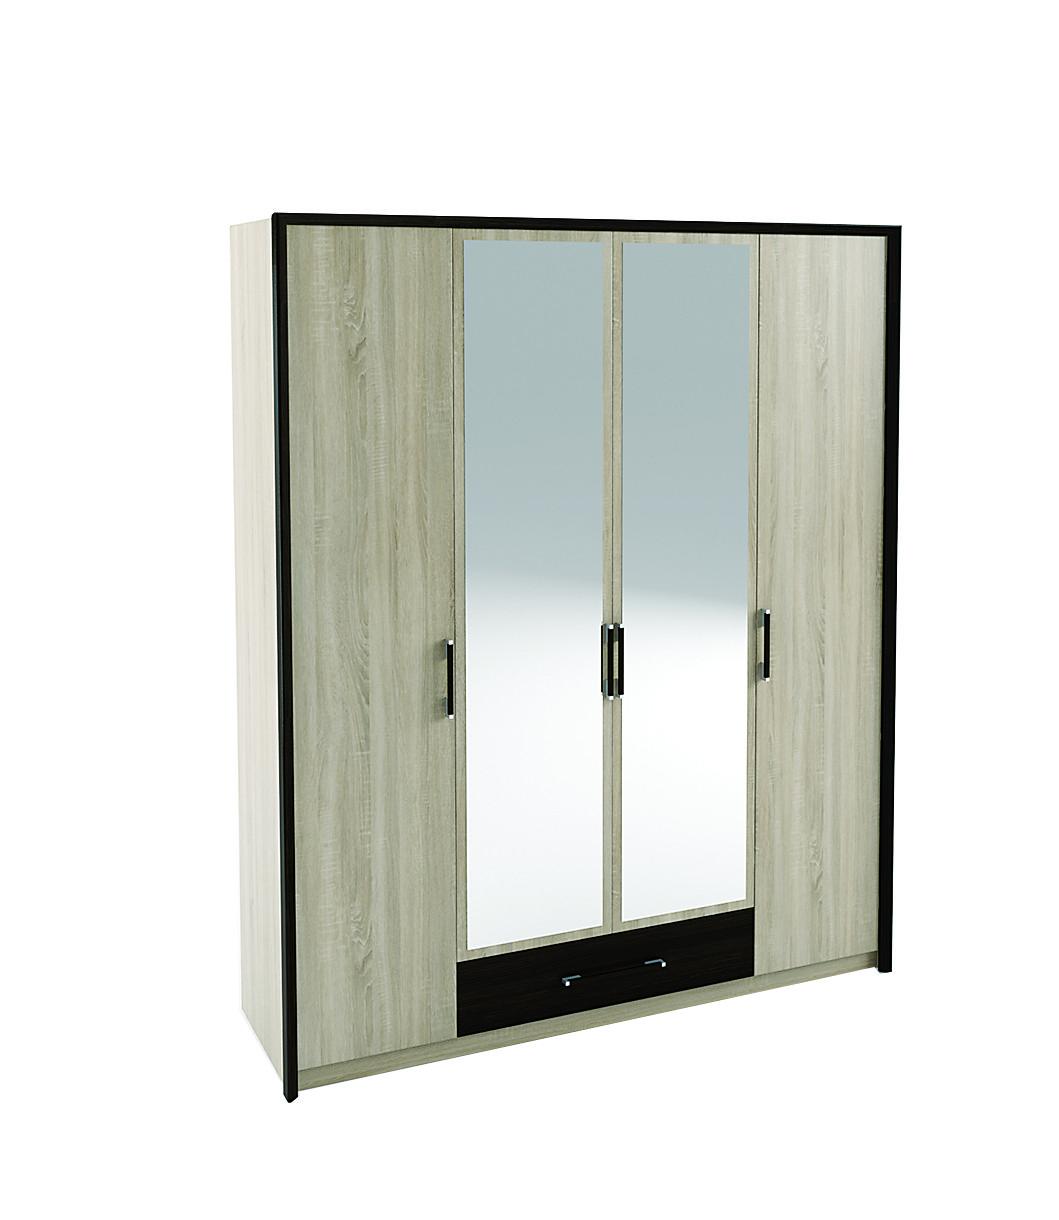 Шафа 4 дверна Спальня Скарлет